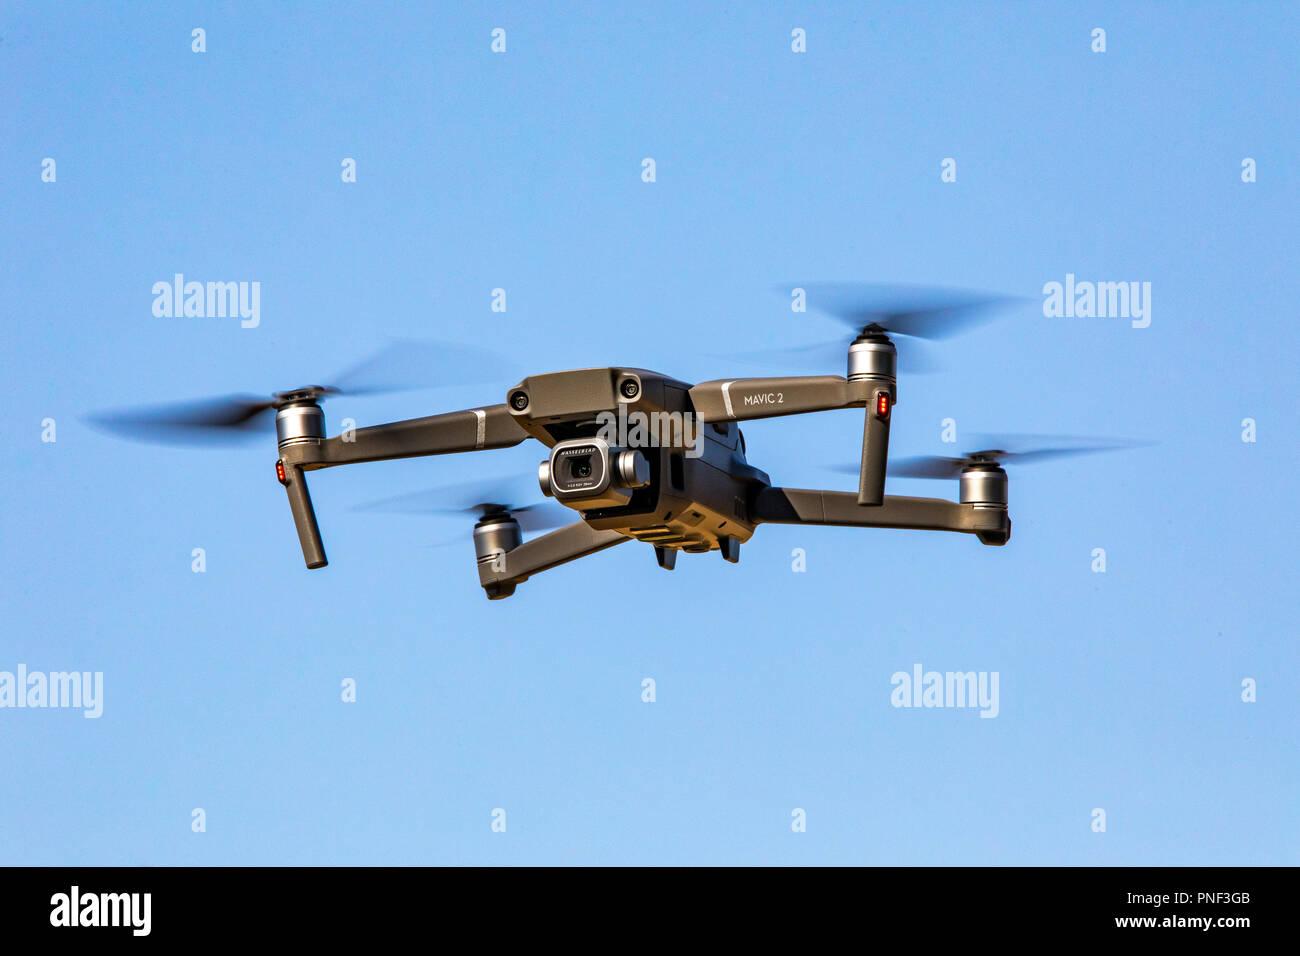 Drohne, A/V, DJI Mavic 2 PRO, Multikopter, mit 20 Megapixel Kamera von Hasselblad, Stockbild